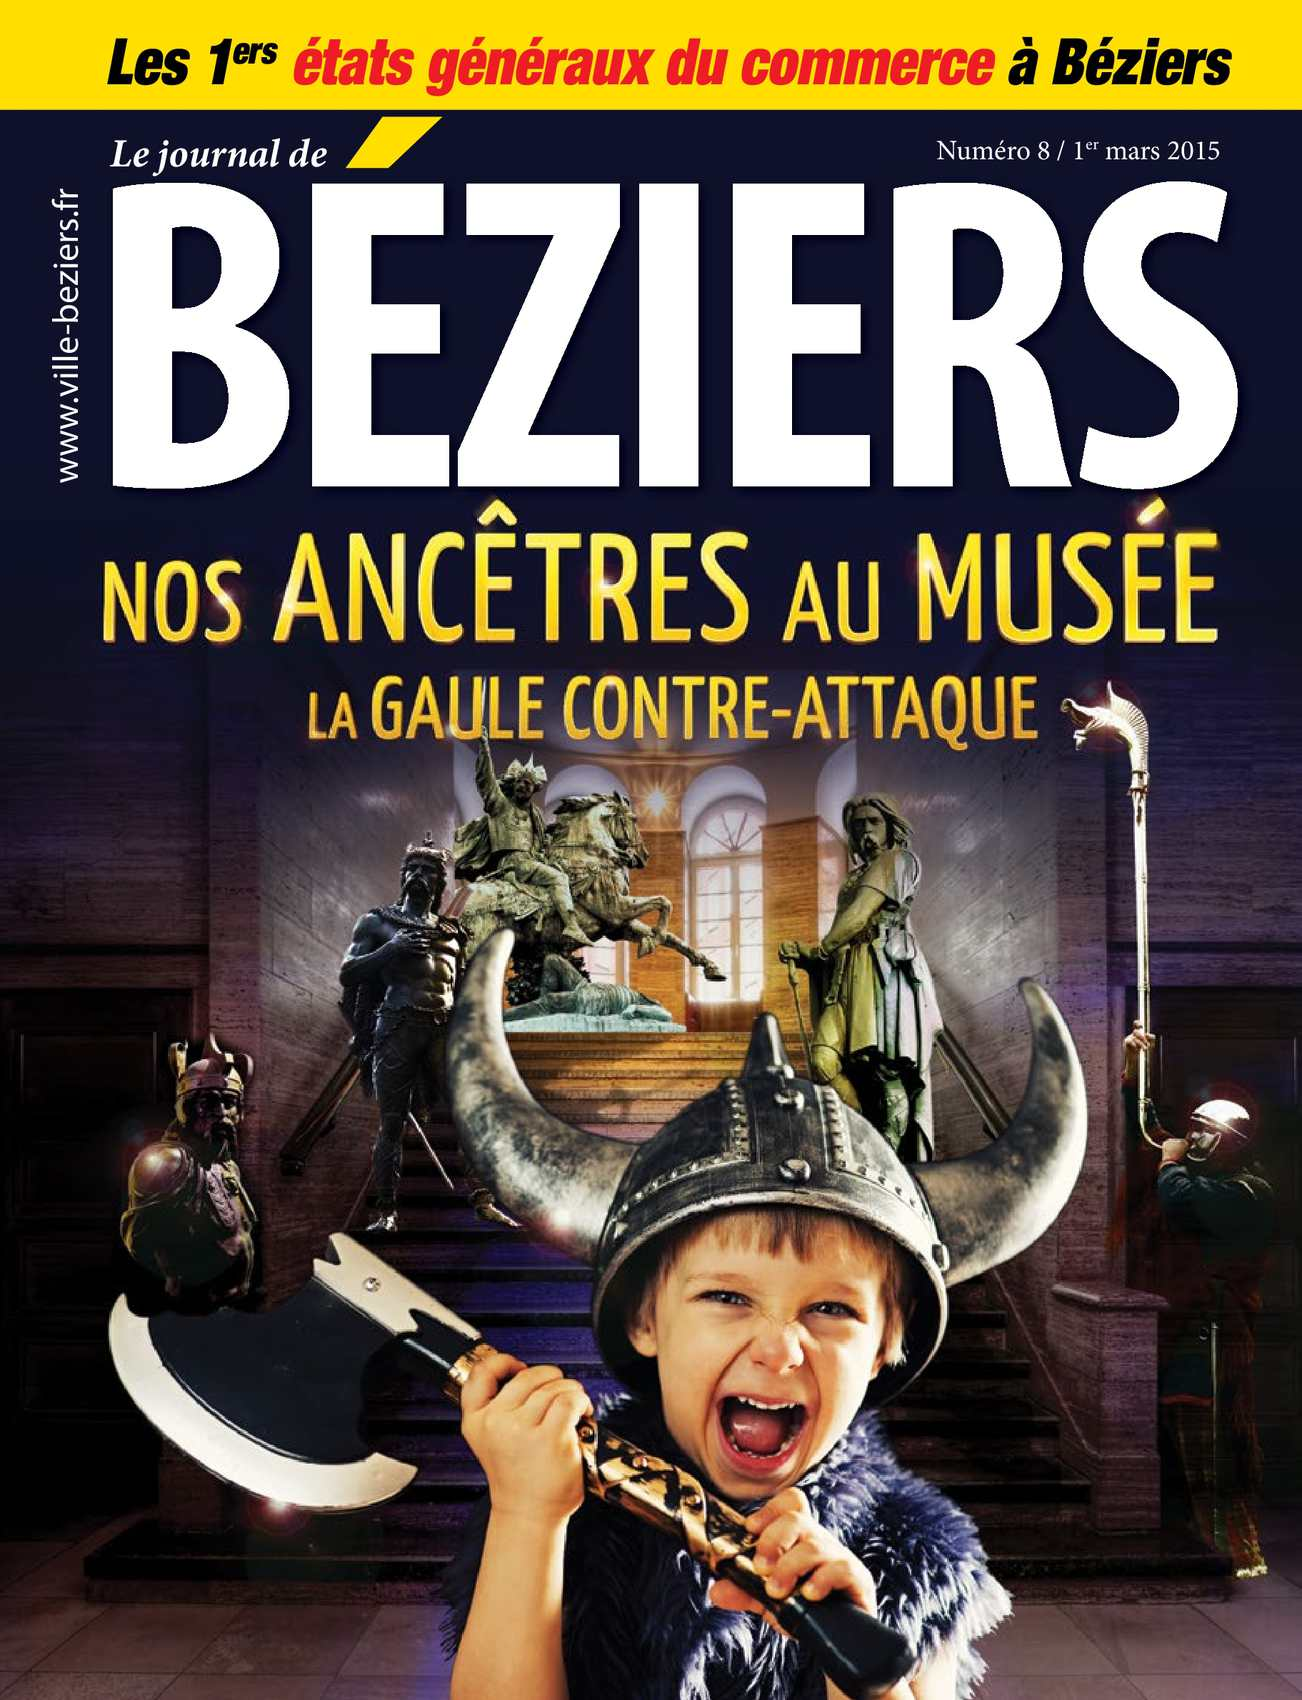 Calam o journal de beziers n 8 mars 2015 for Piscine municipale beziers